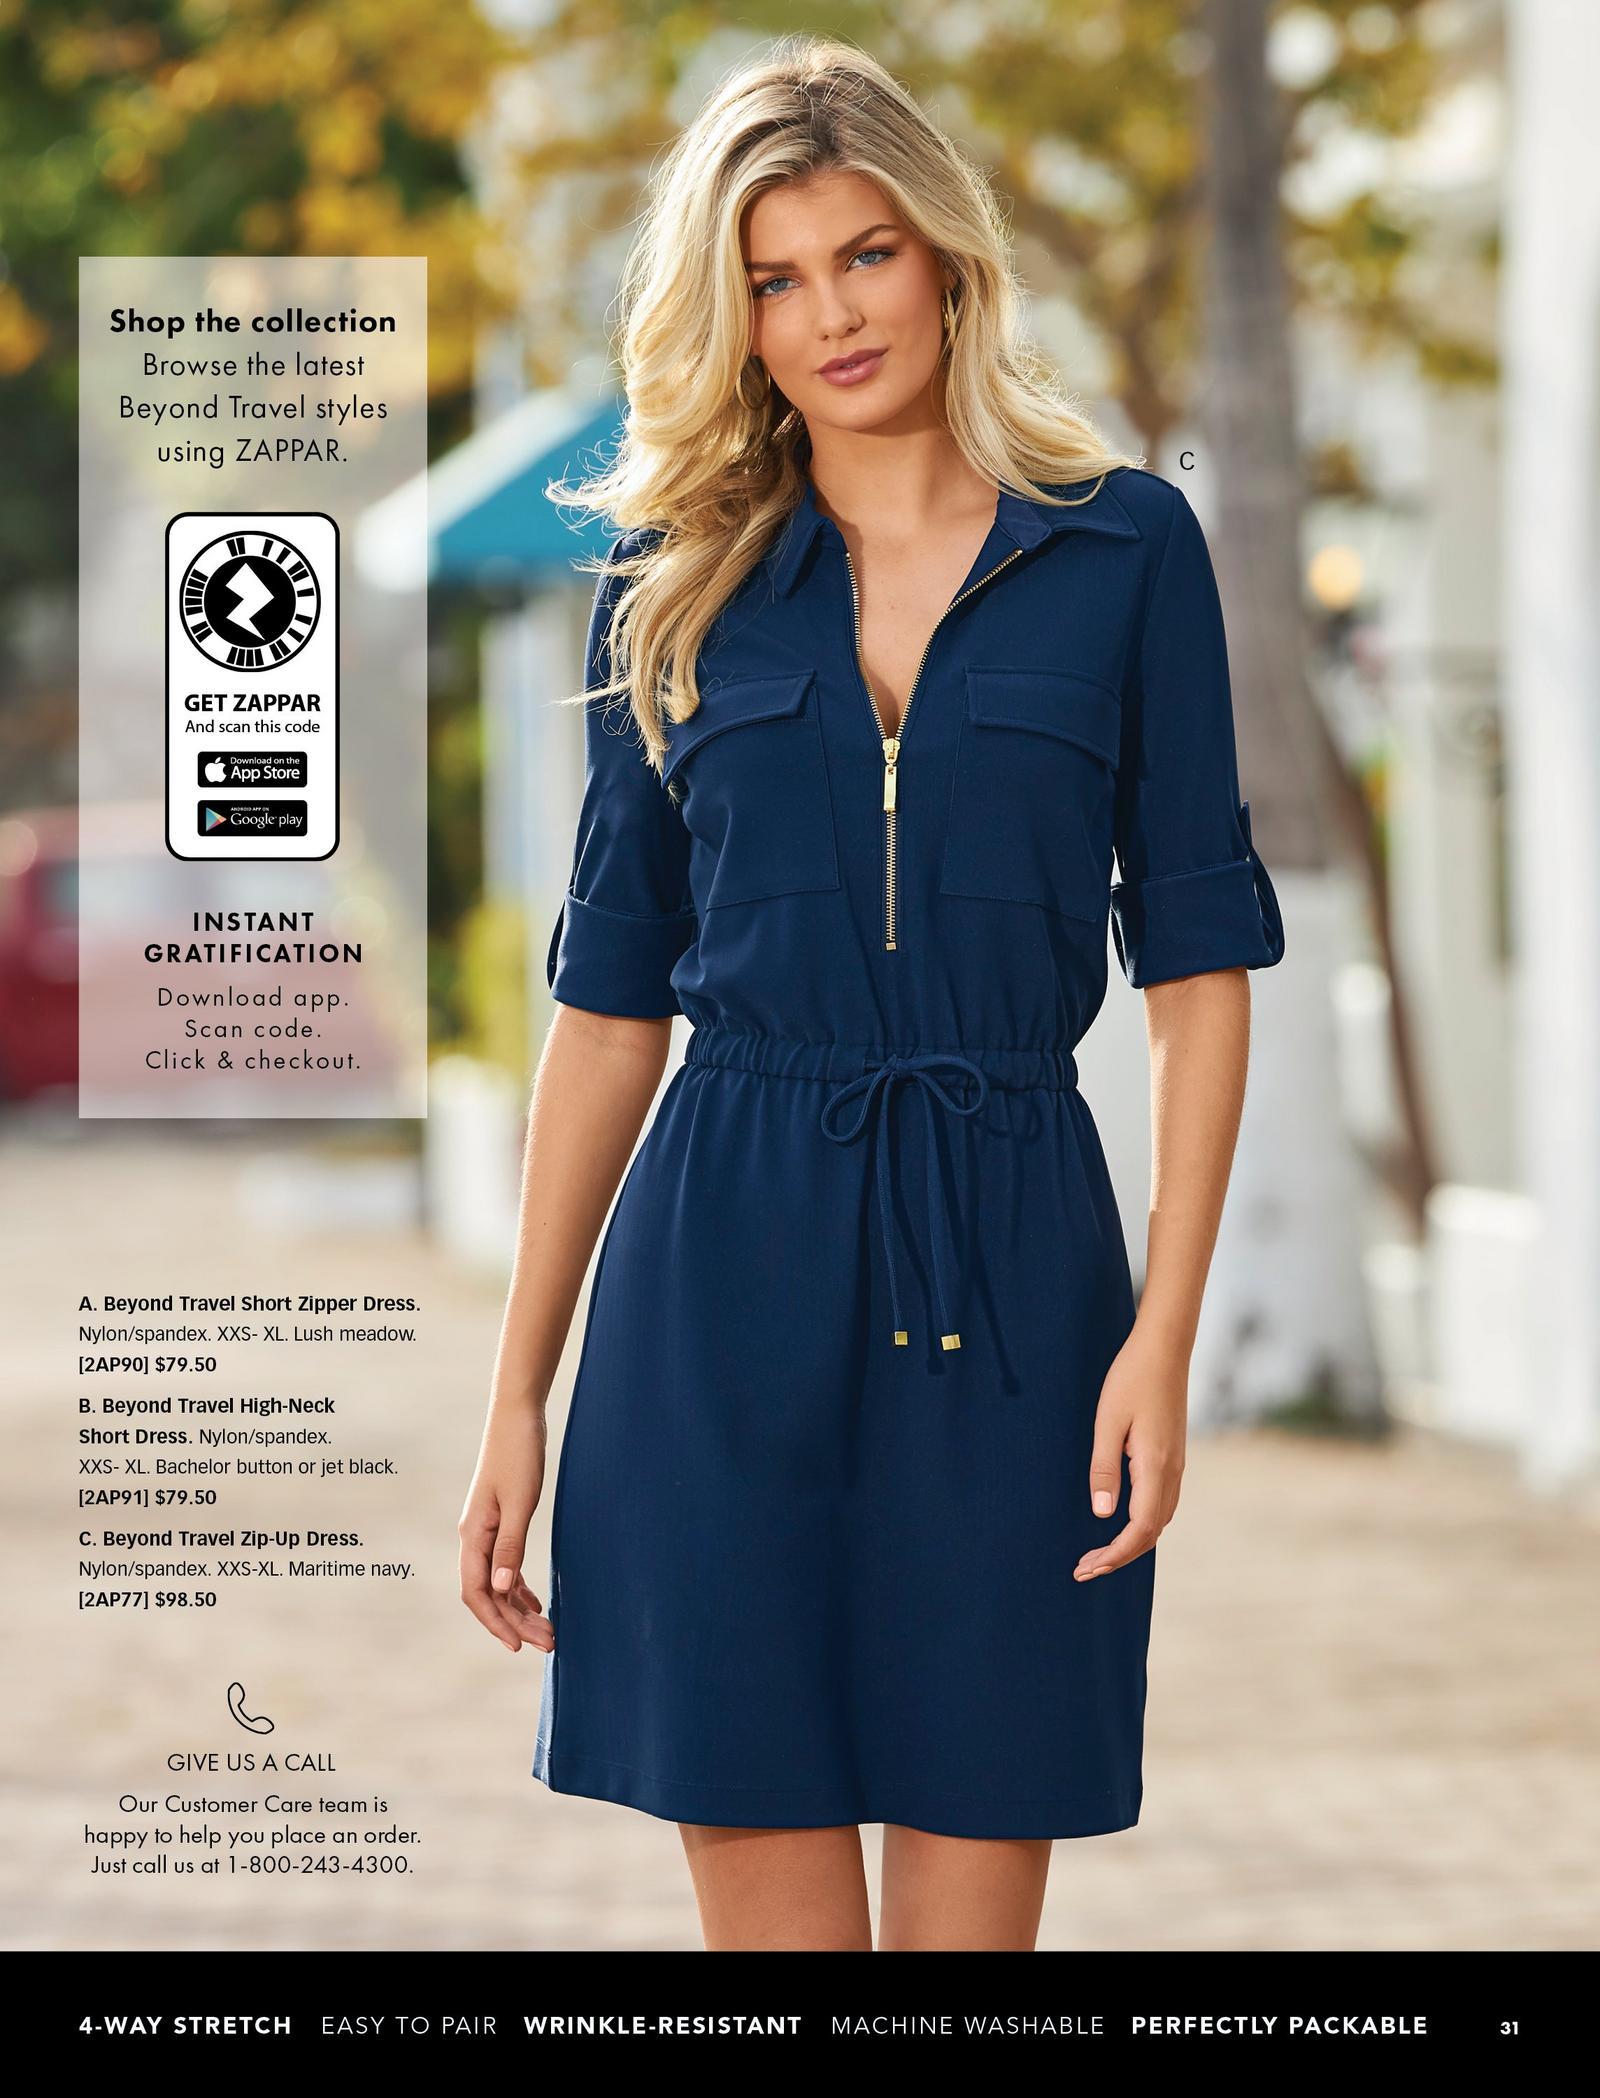 model wearing a navy zip-up tie-waist dress.